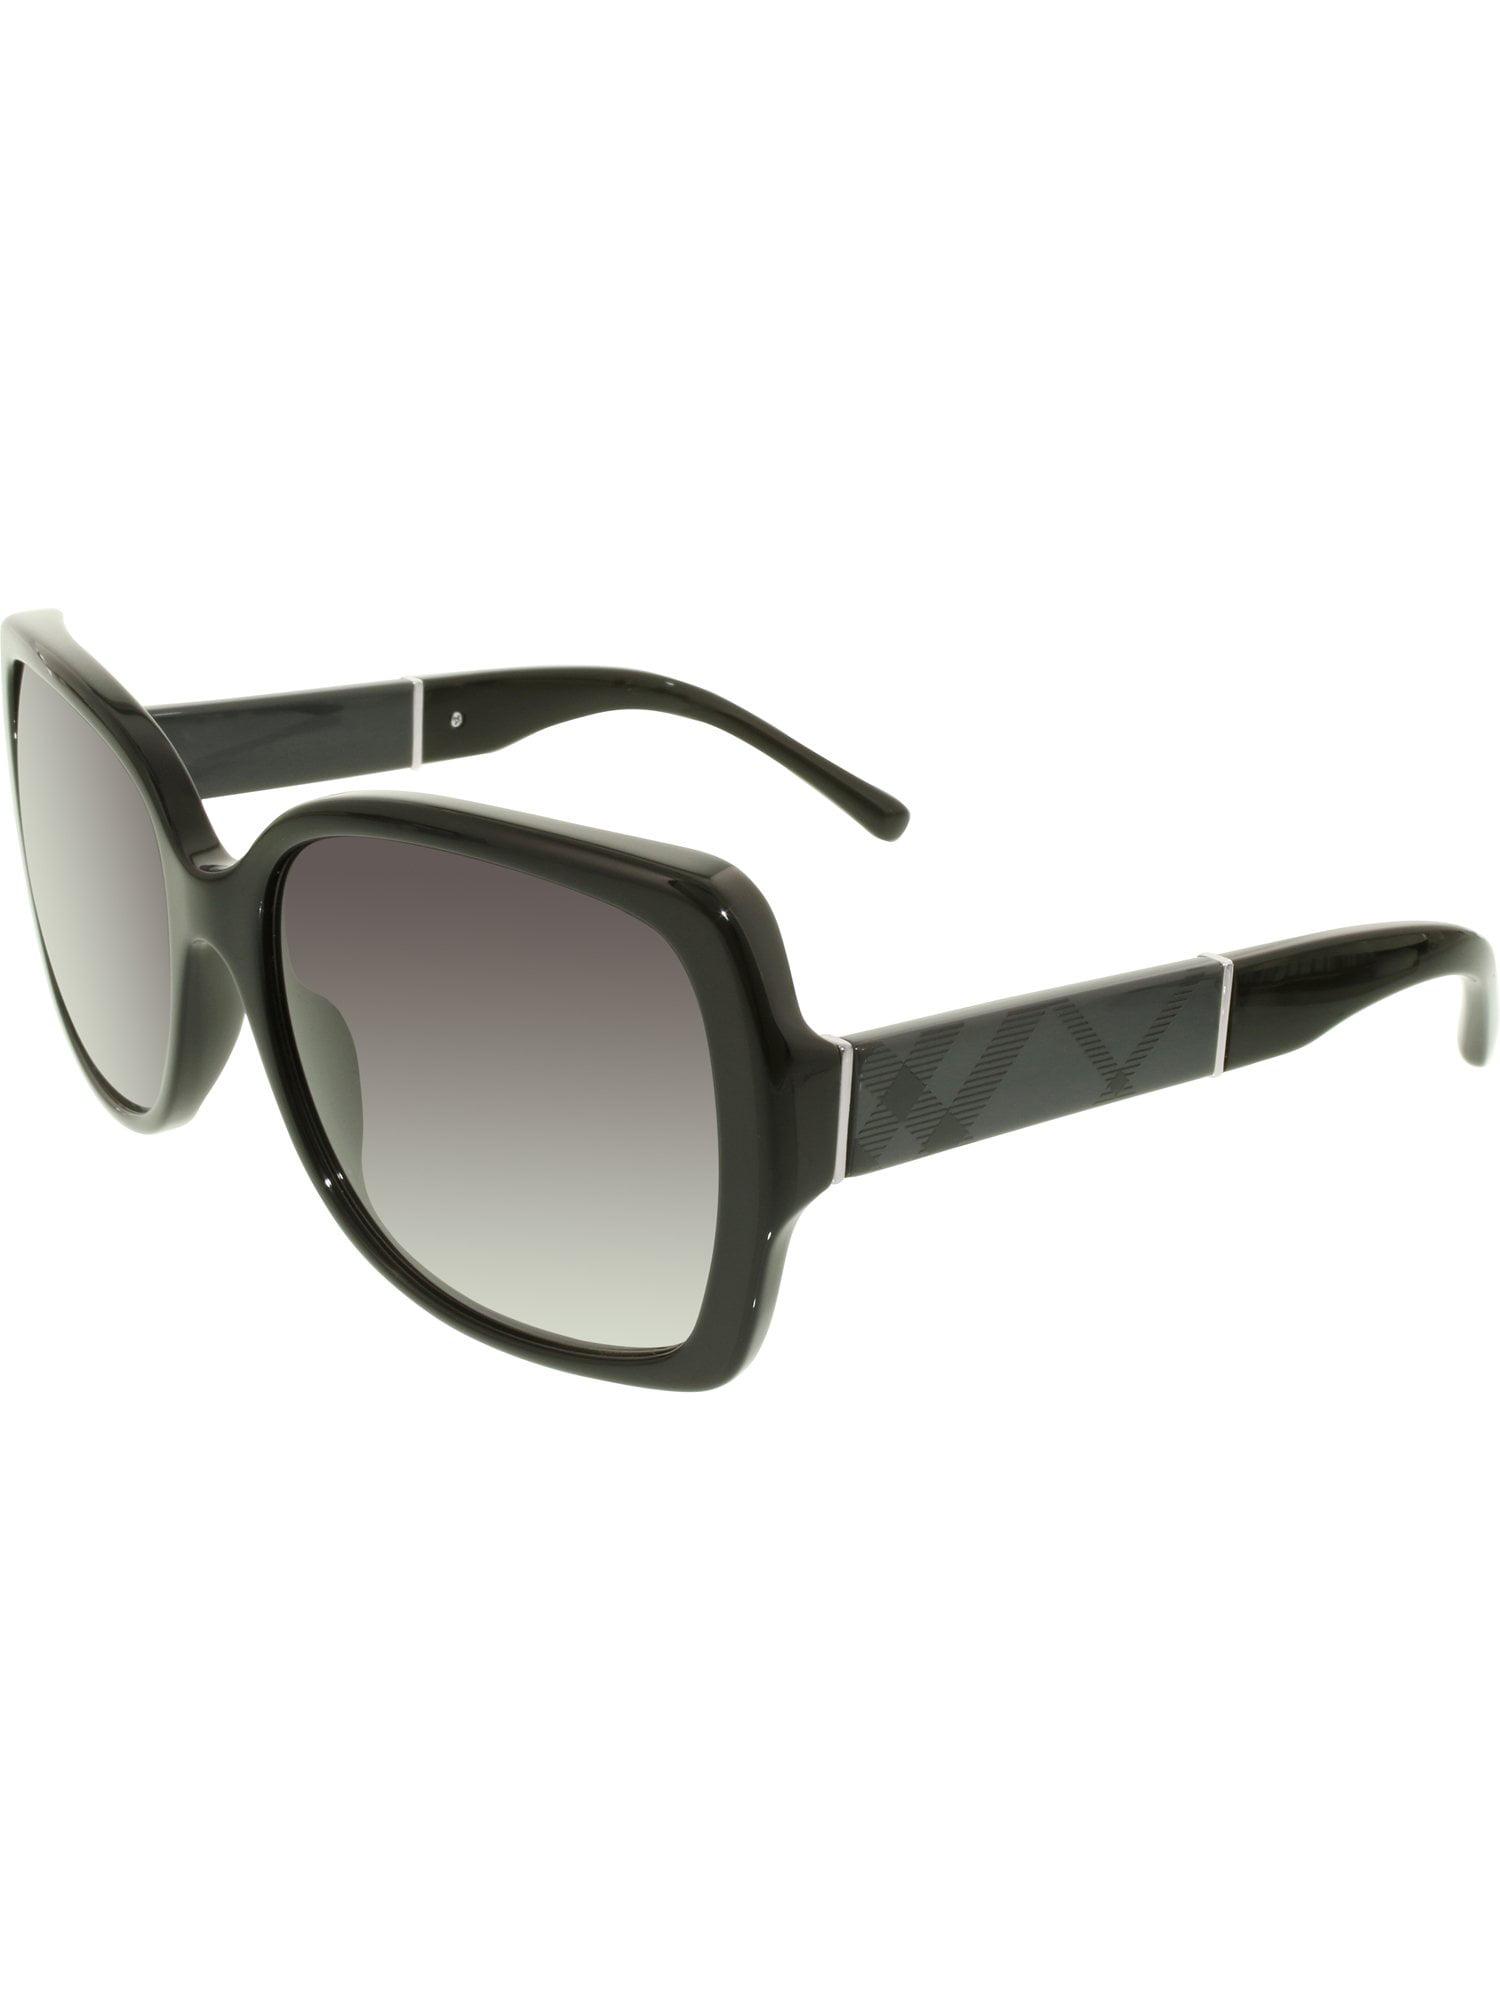 a6f2778d551d Burberry - Women s Gradient BE4160-30018G-58 Black Square Sunglasses -  Walmart.com